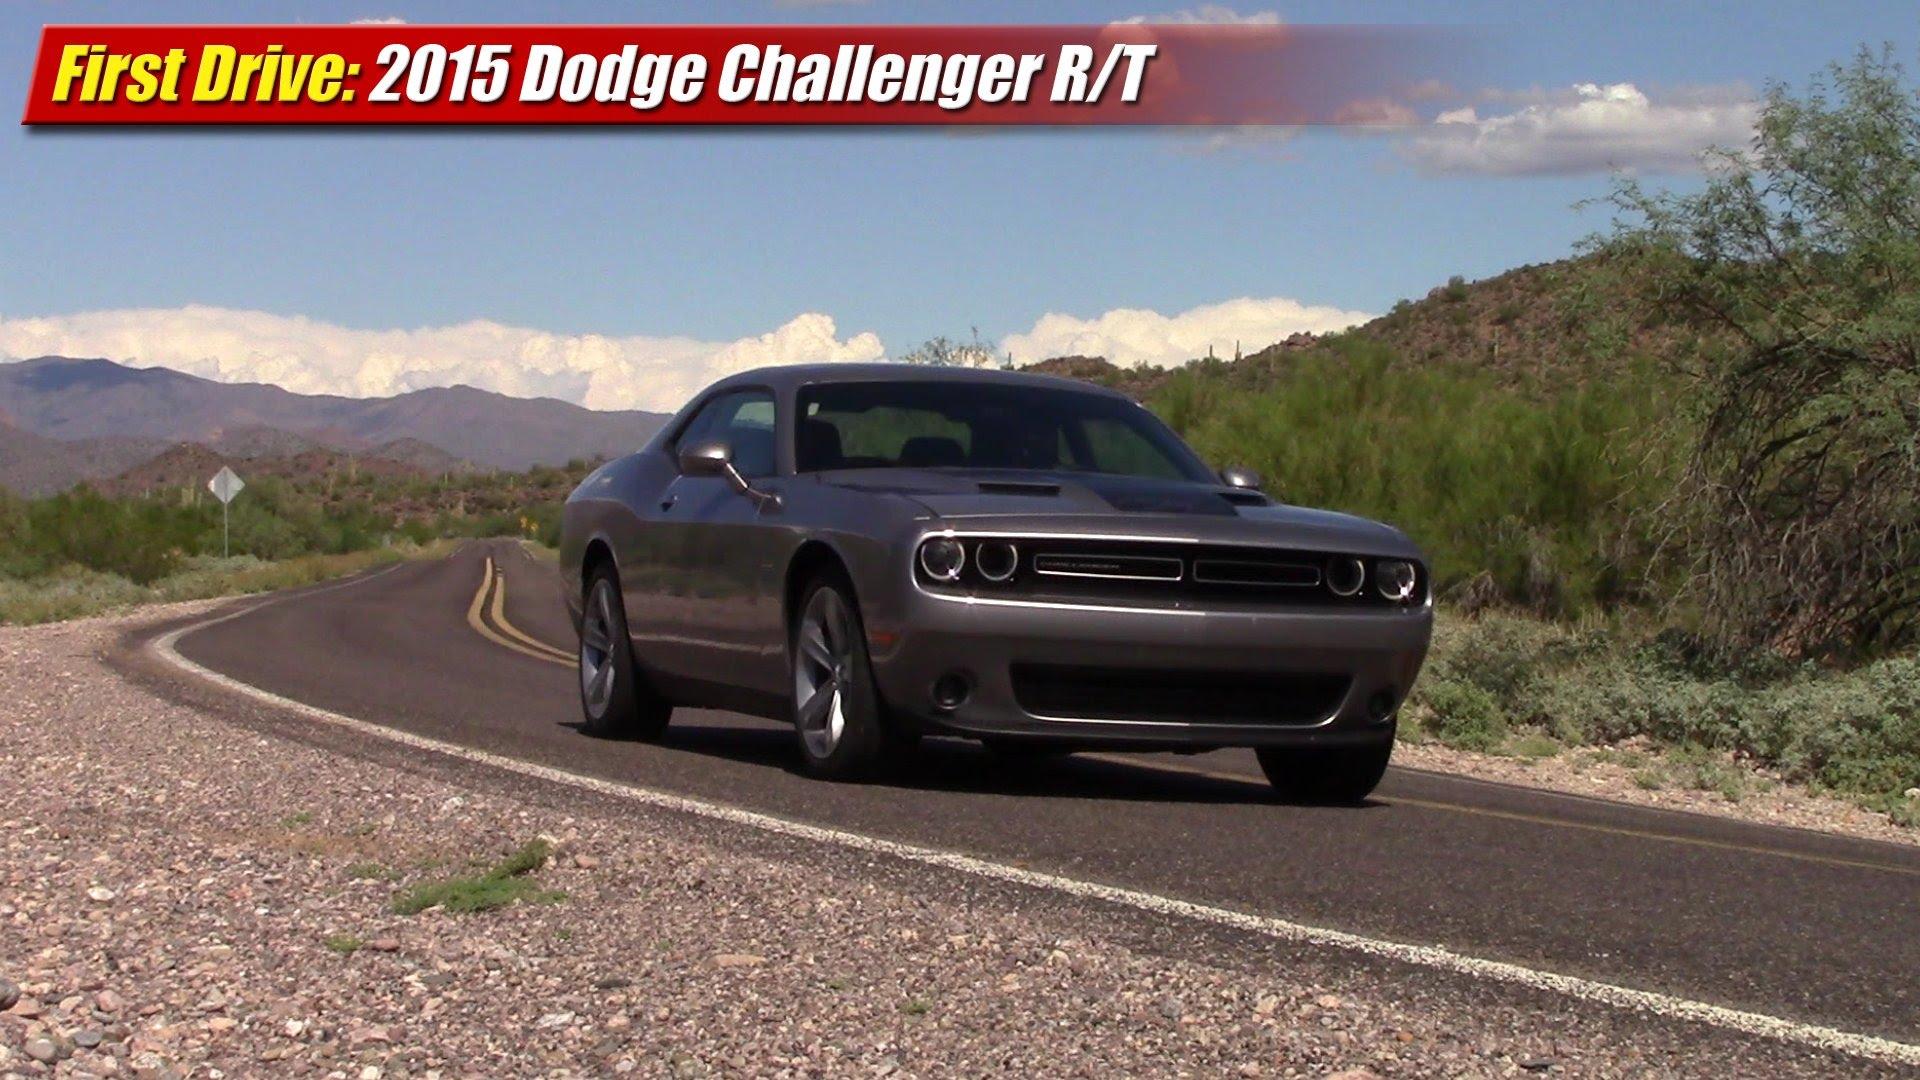 dodge r t challenger hot z network rod rodding articles popular rt